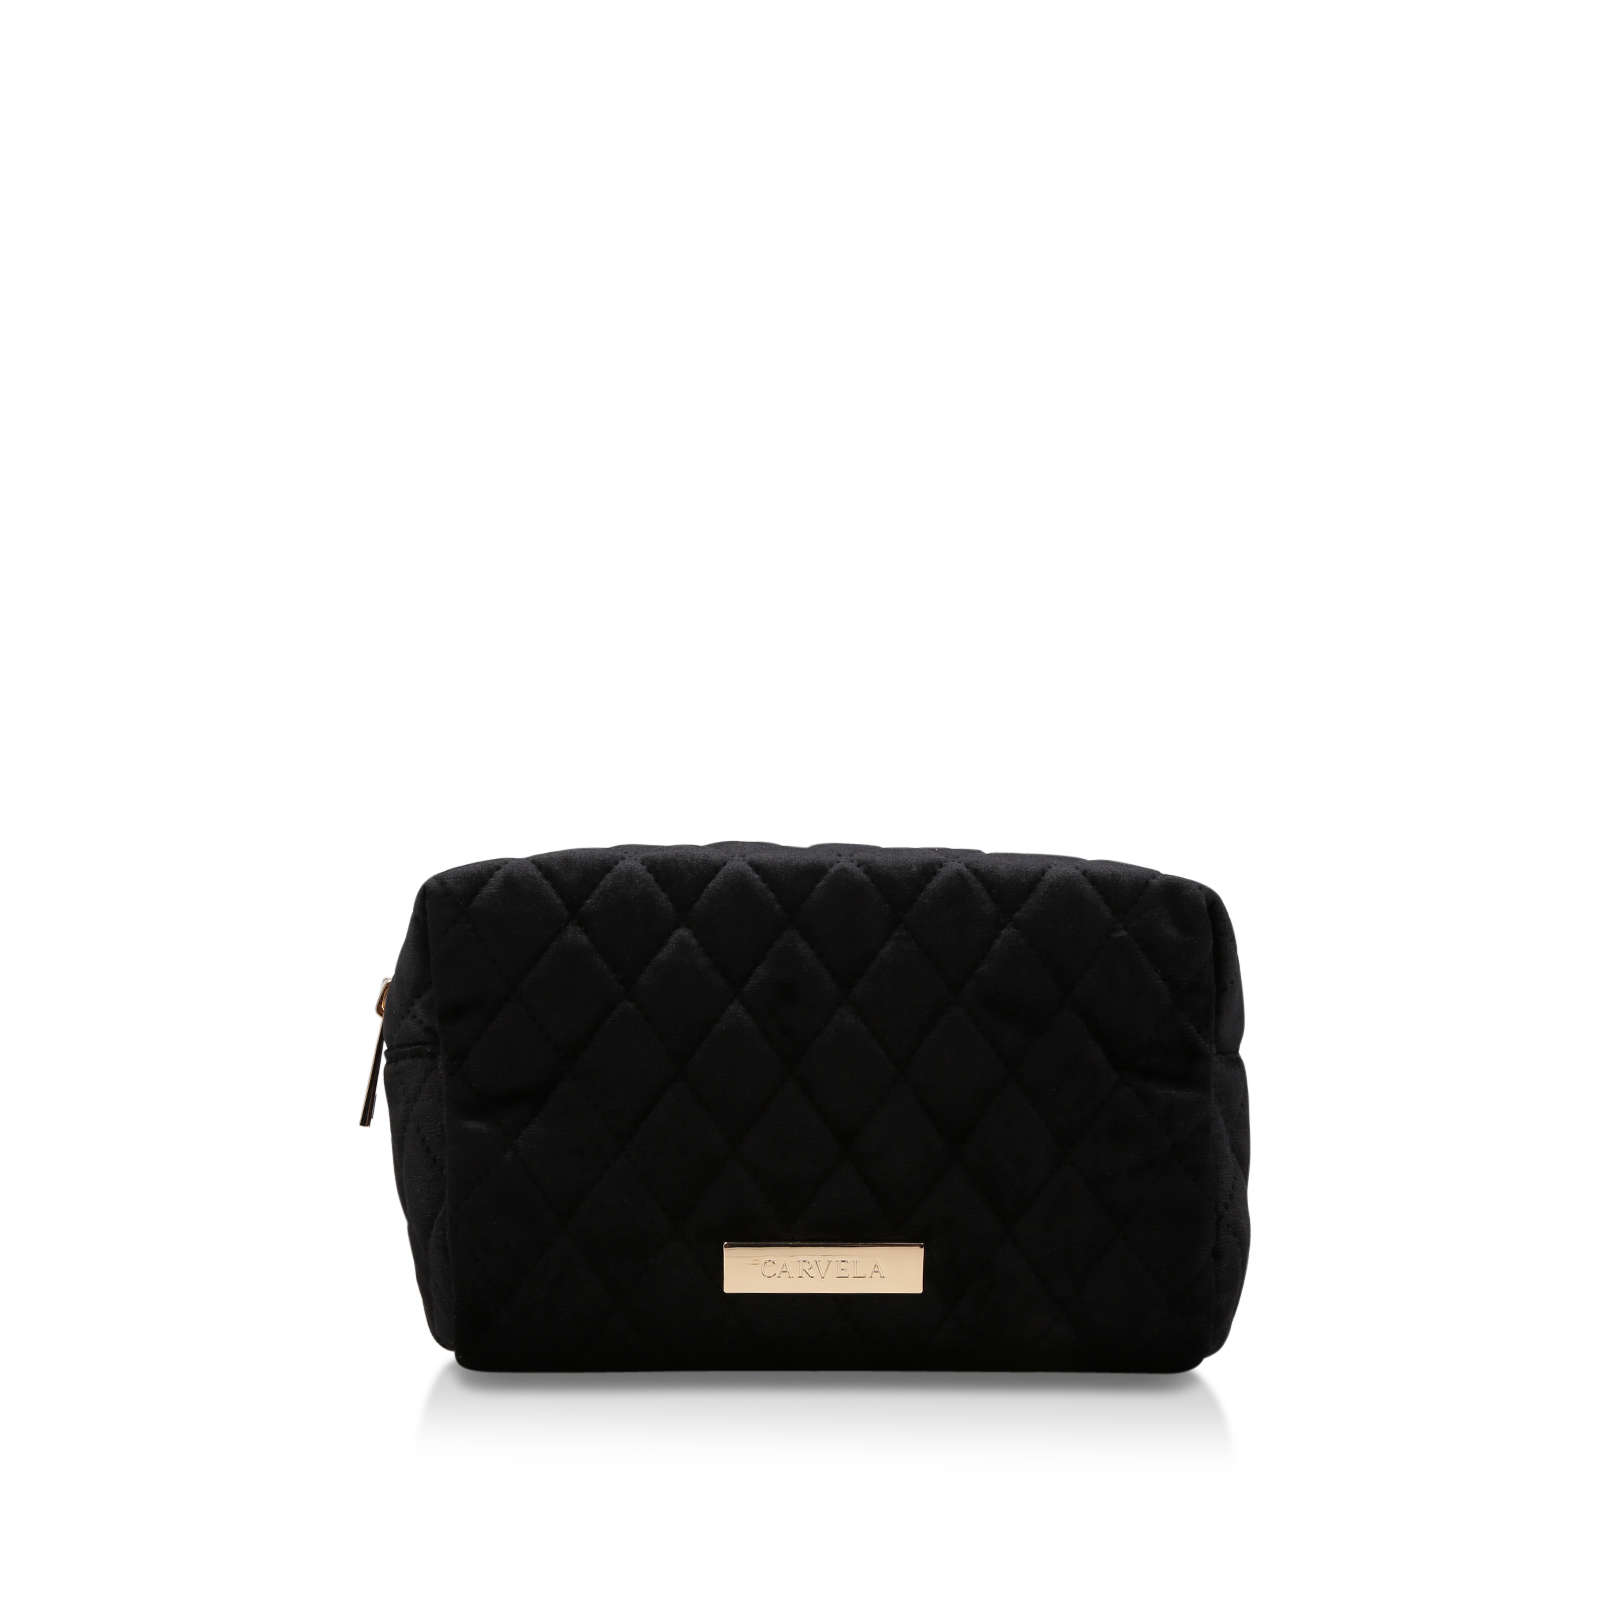 Ryley Cosmetic Bag by Carvela